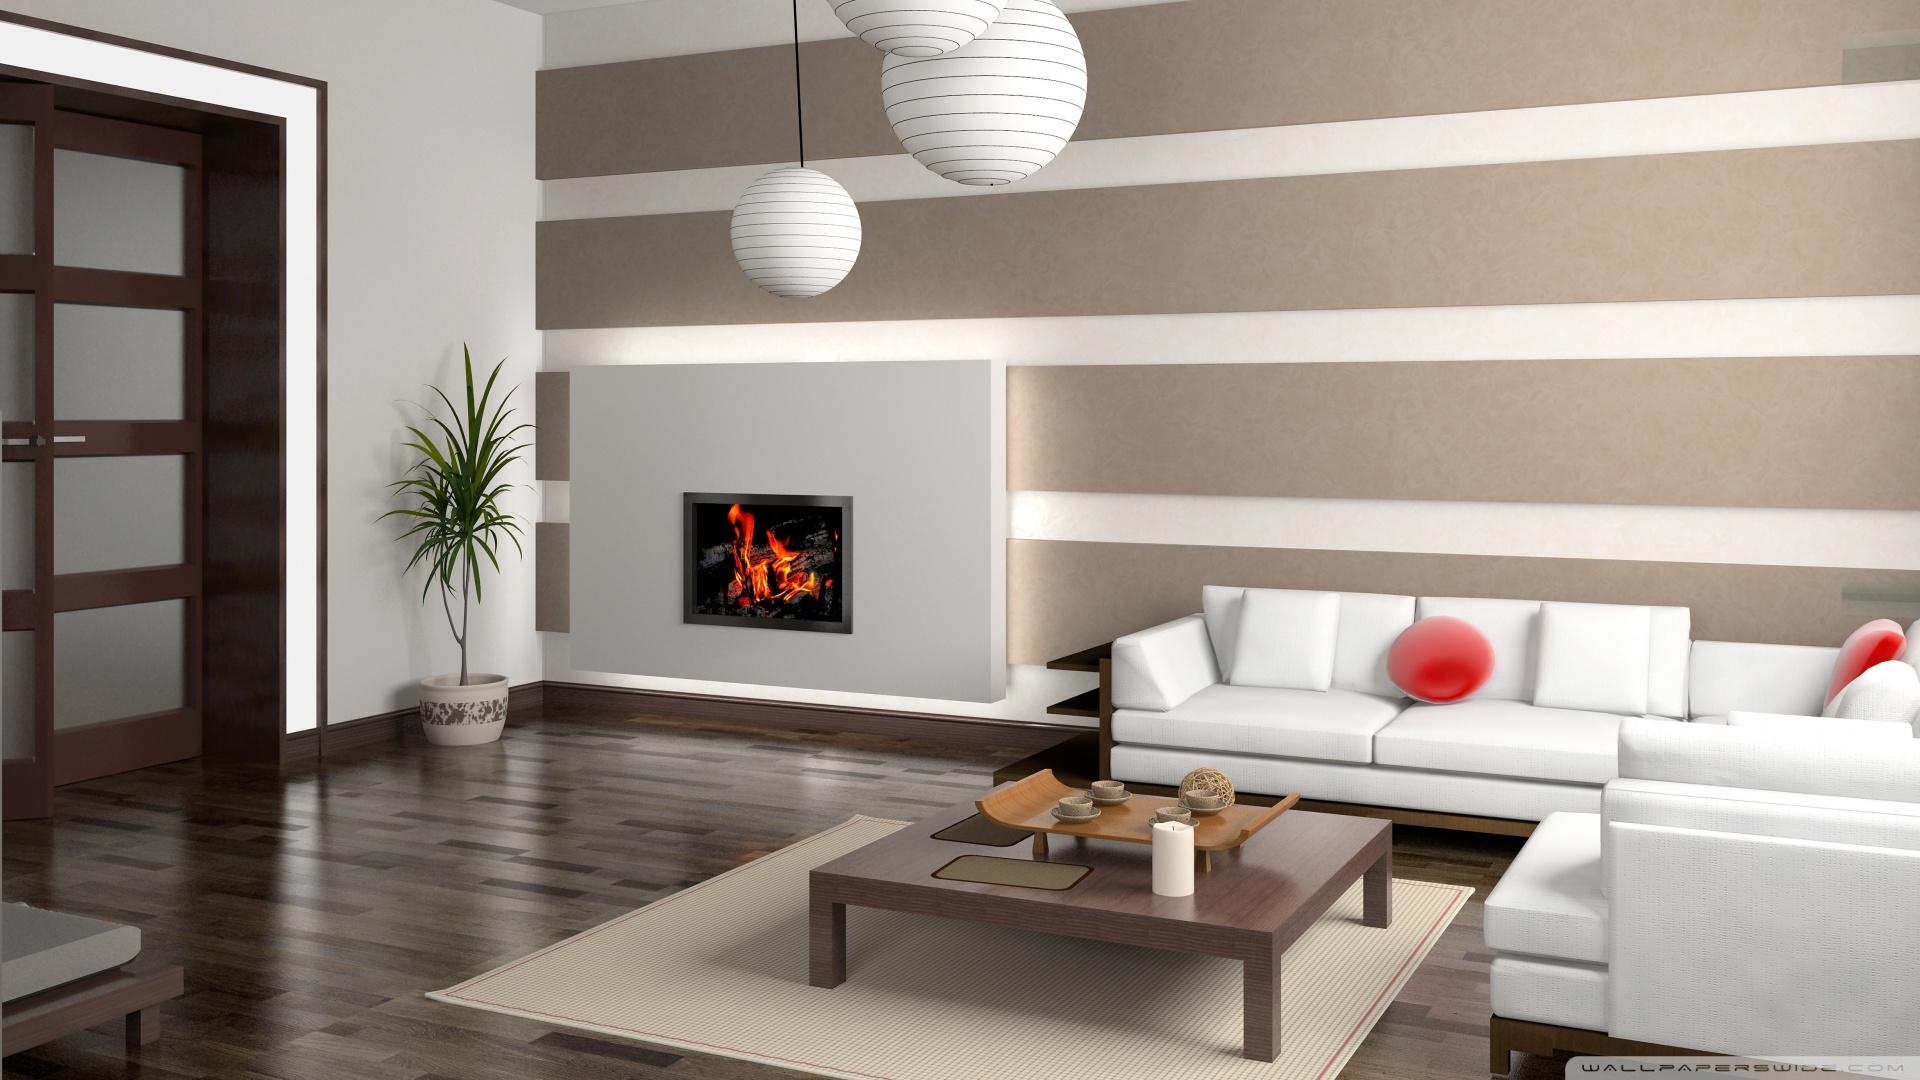 Living Room Wallpaper Best Amazing Living Room Wallpaper Living Room Wallpaper Hd My Ideas More - NY Home Decor